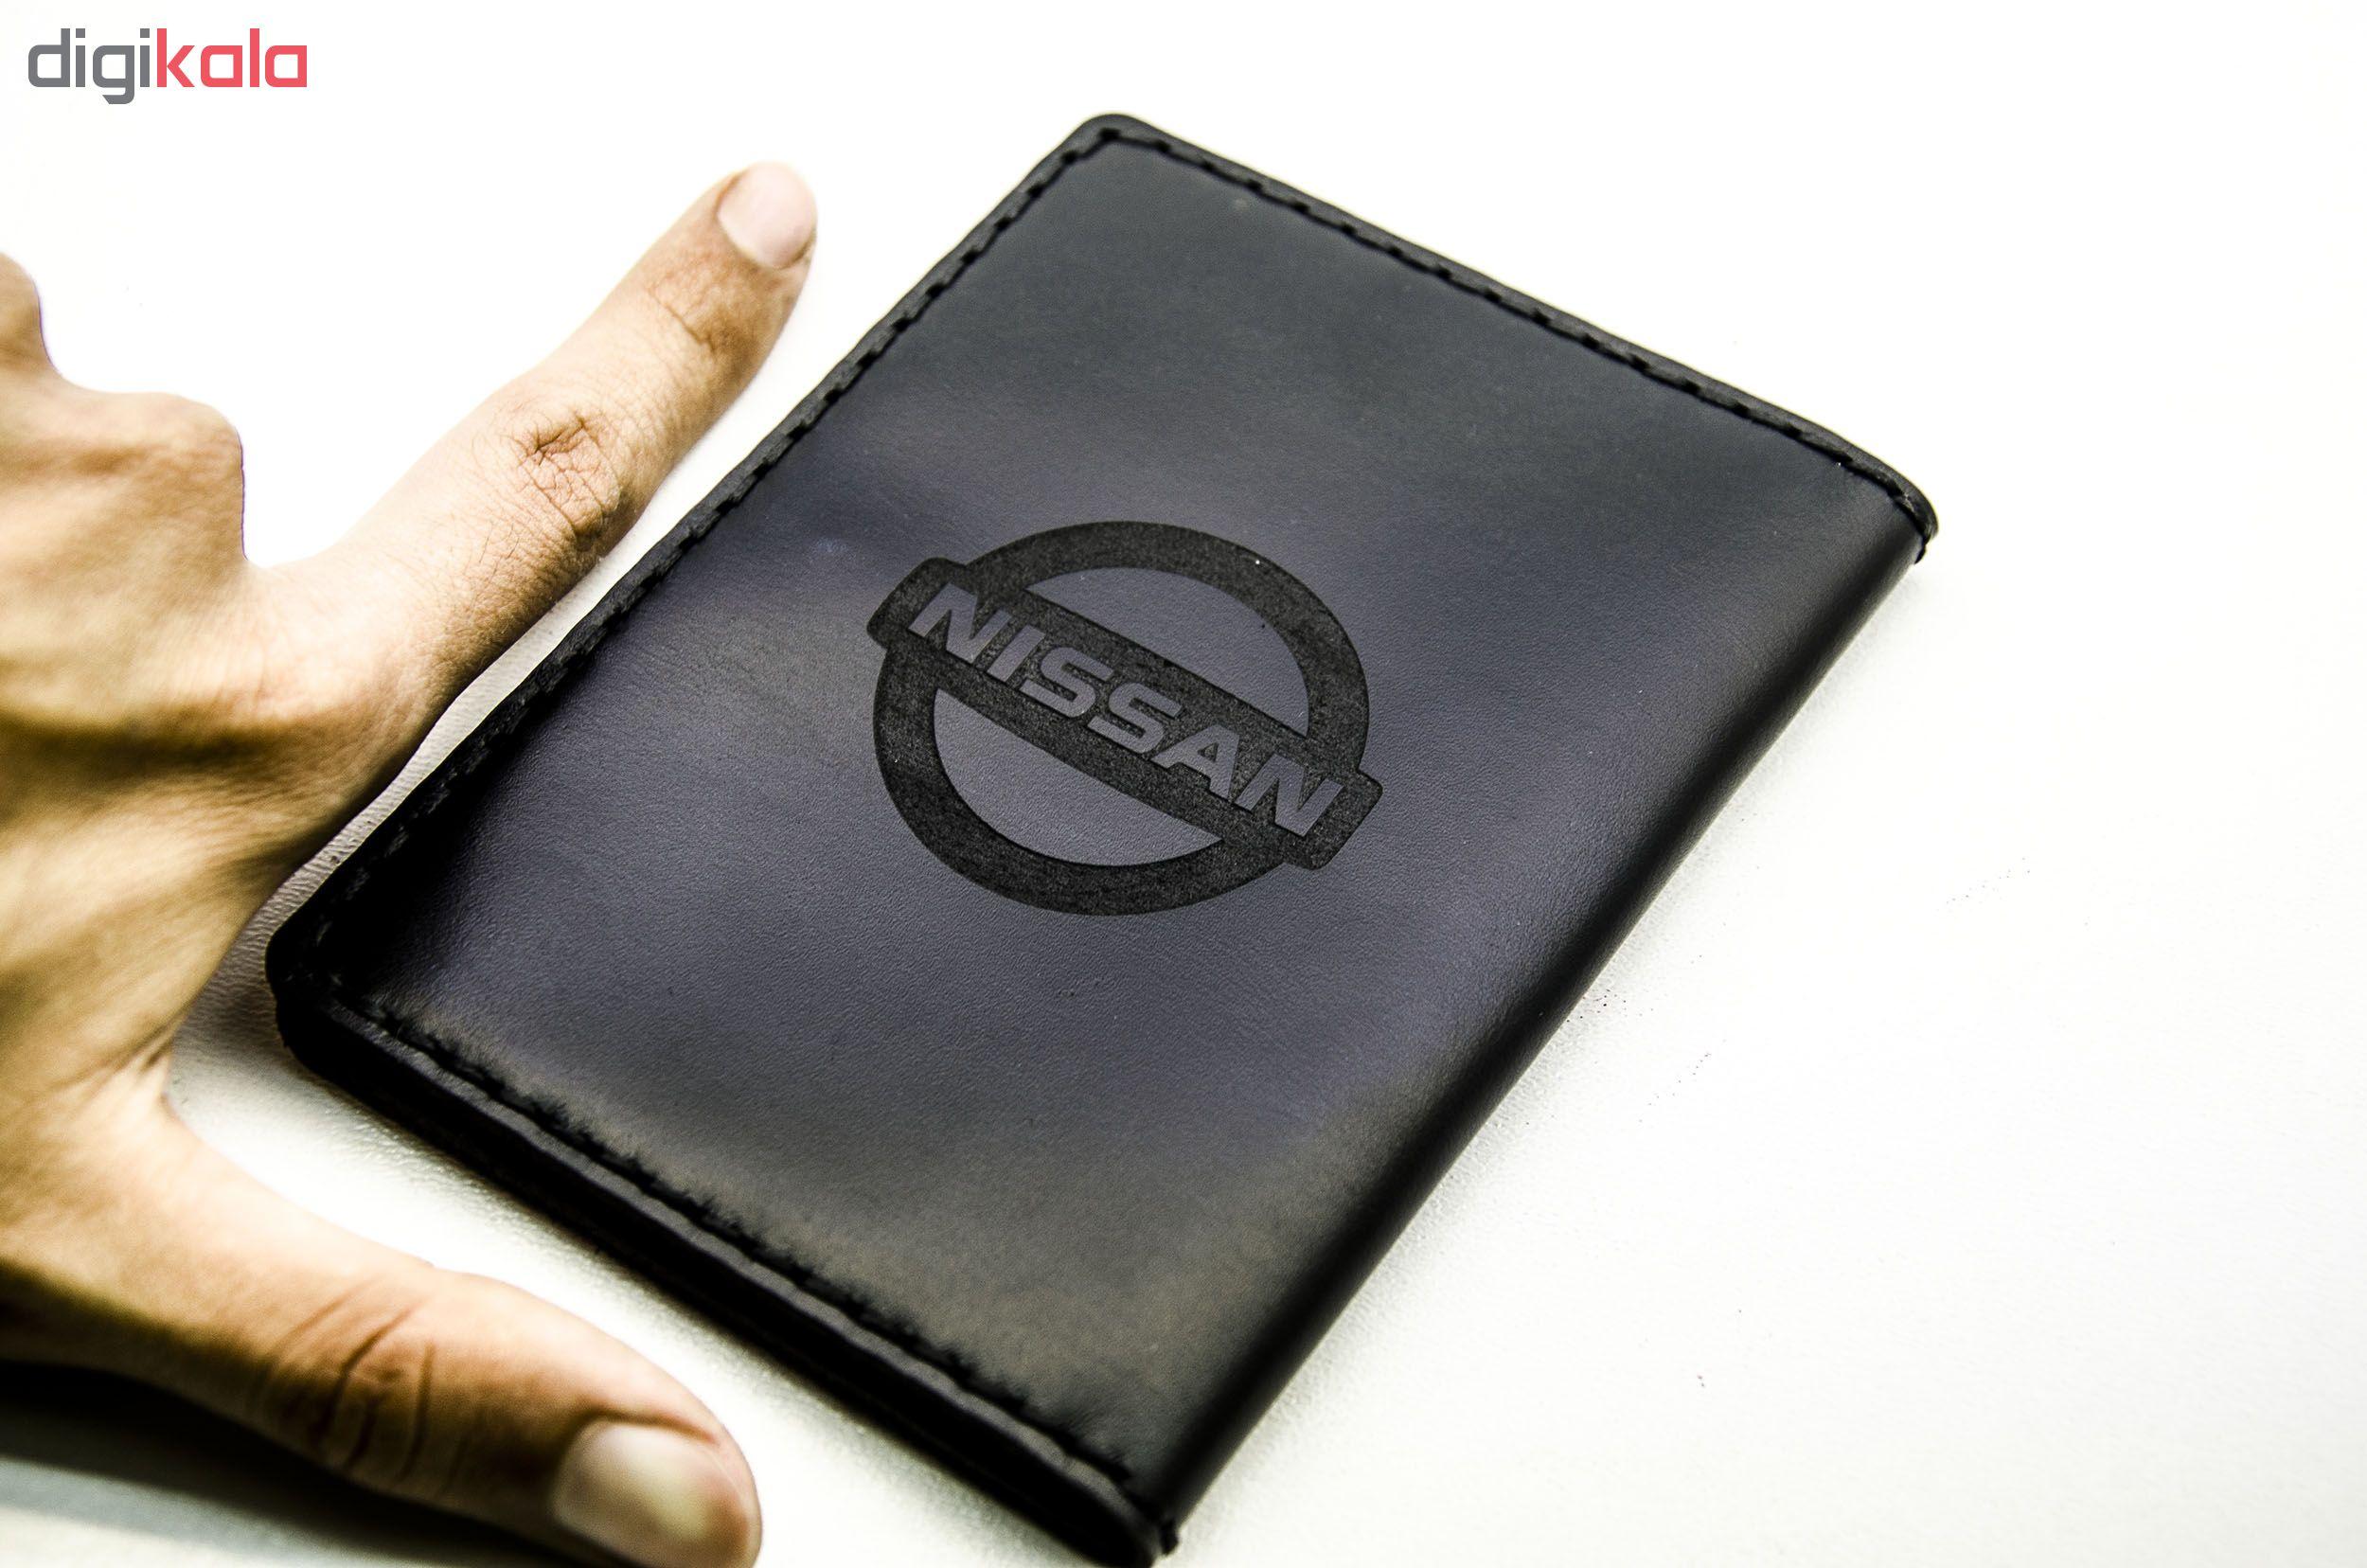 کیف مدارک مردانه چرمینه اسپرت طرح نیسان کد 43024-B main 1 1